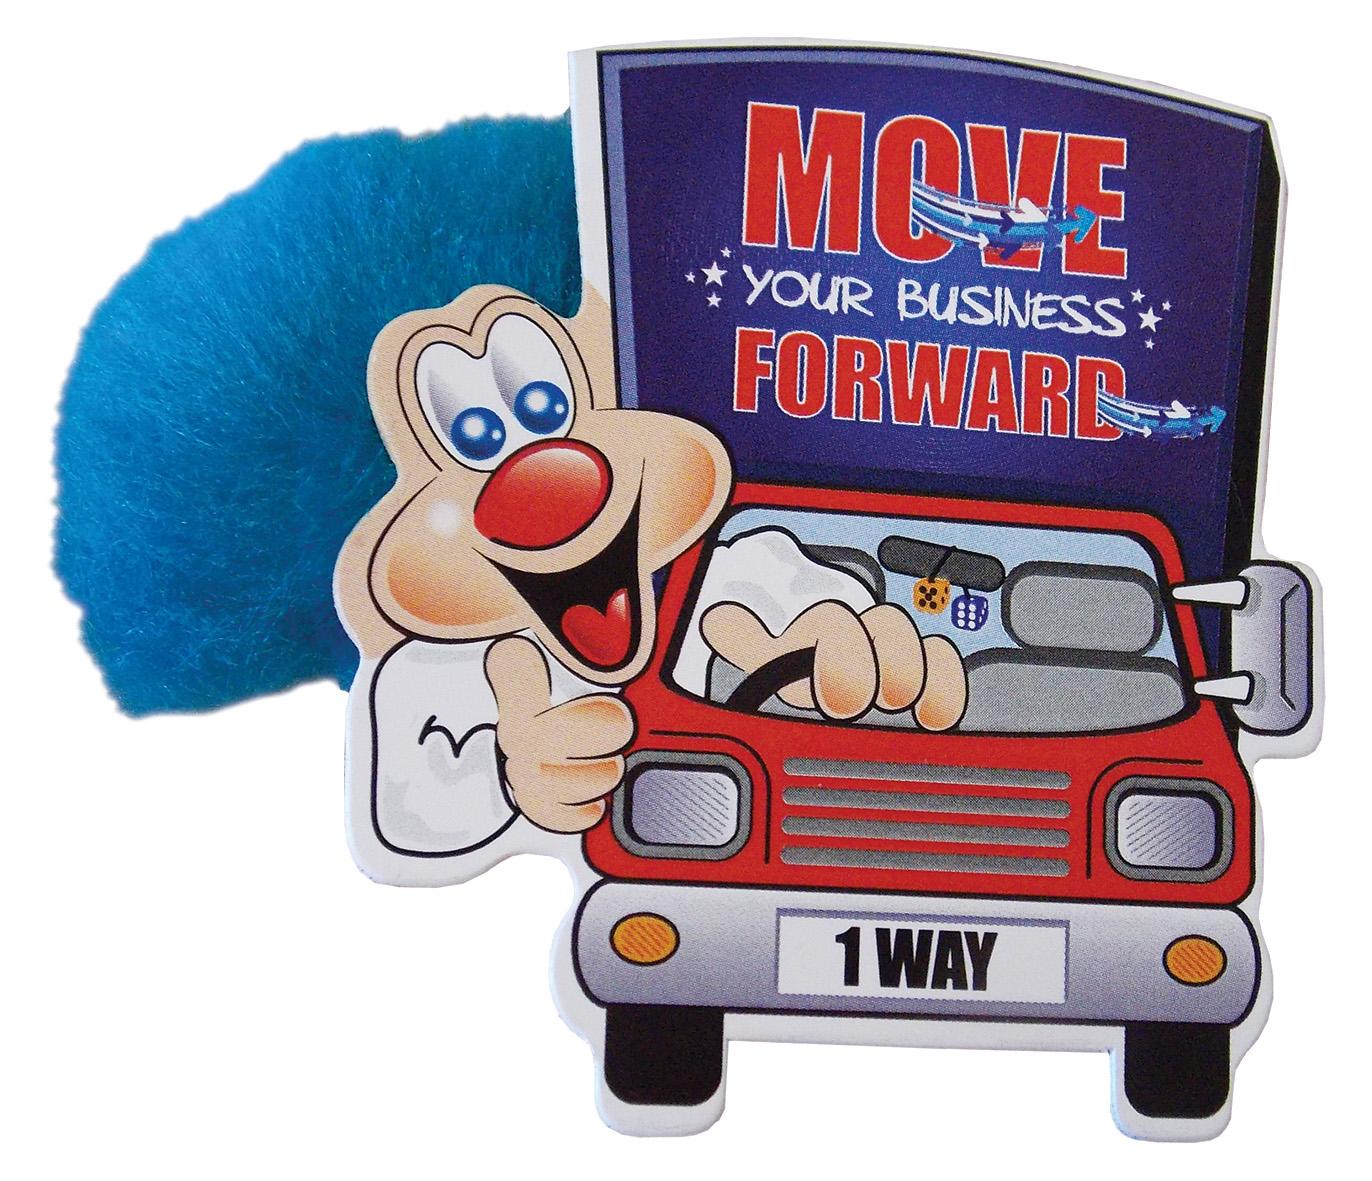 Promotional Adman Van/Lorry